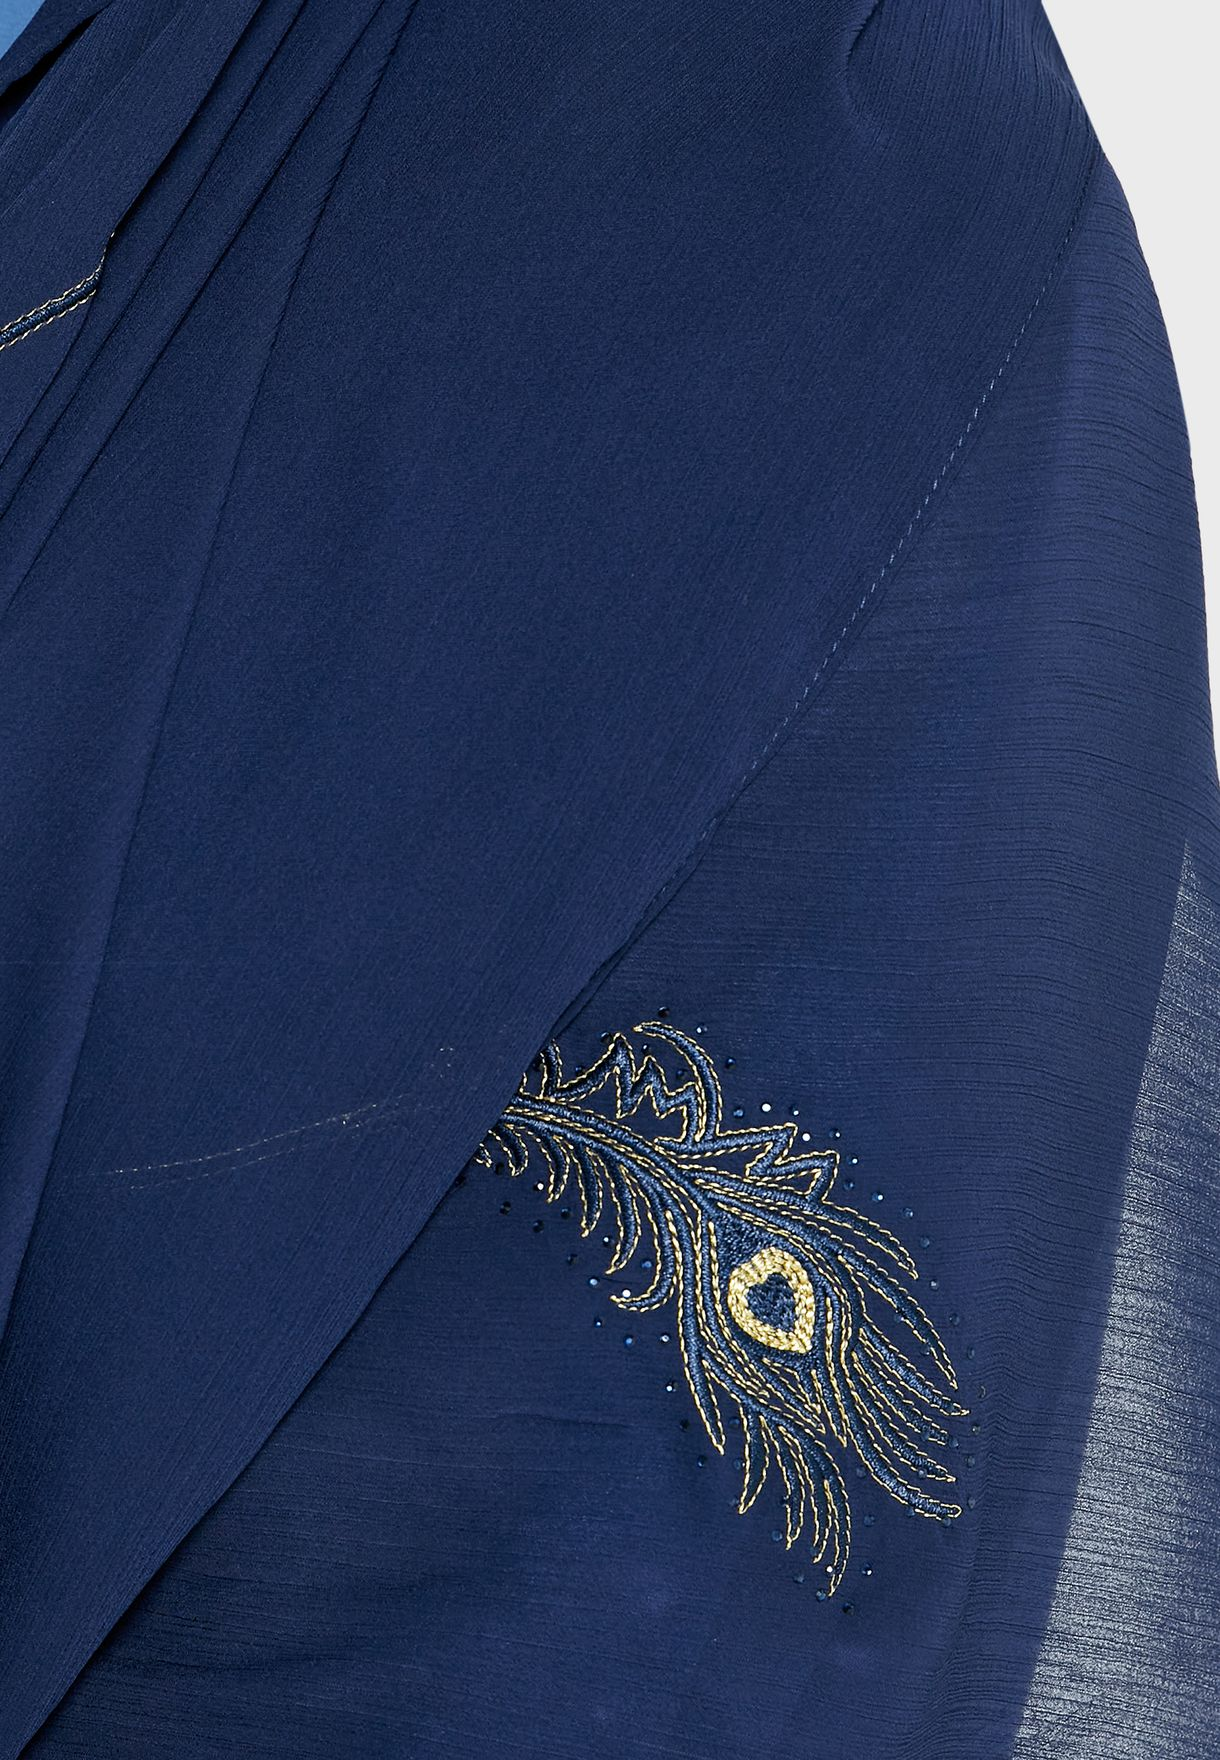 Embroidered Hijab